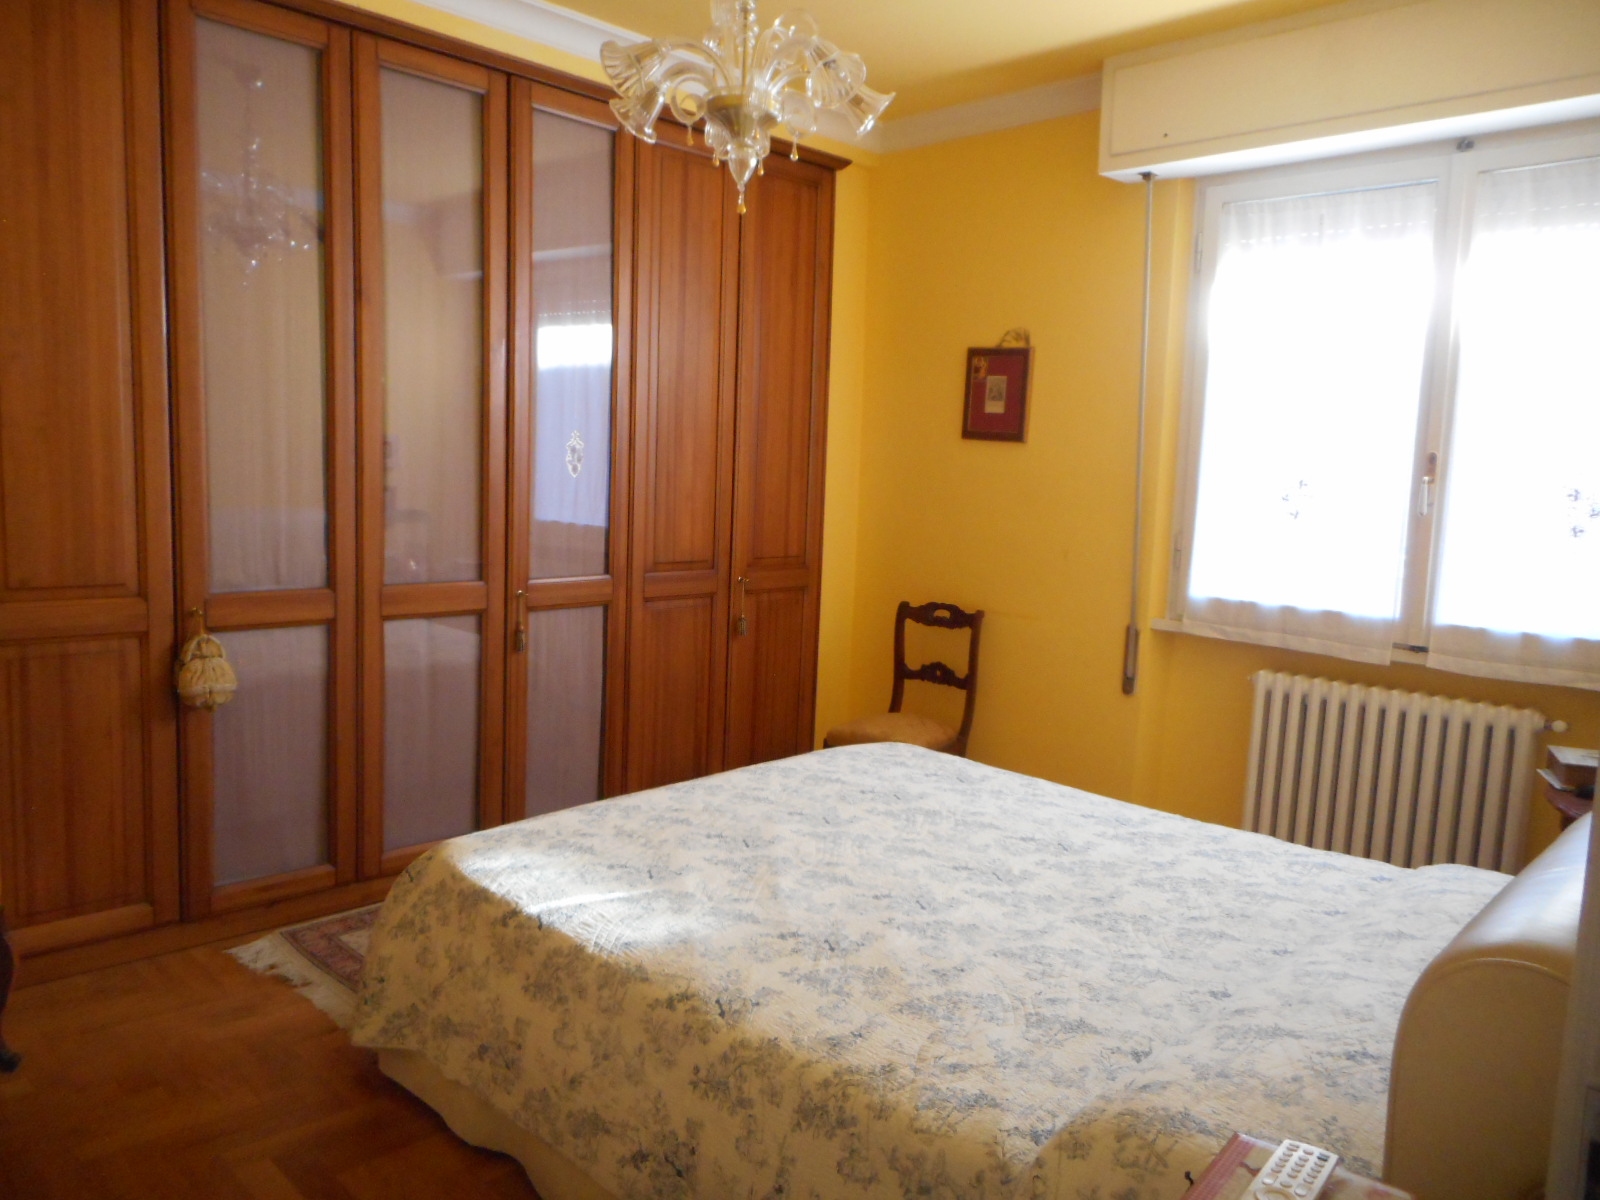 zona centrale,pistoia,51100,2 Bedrooms Bedrooms,1 BagnoBathrooms,Appartamento,zona centrale,4,1103